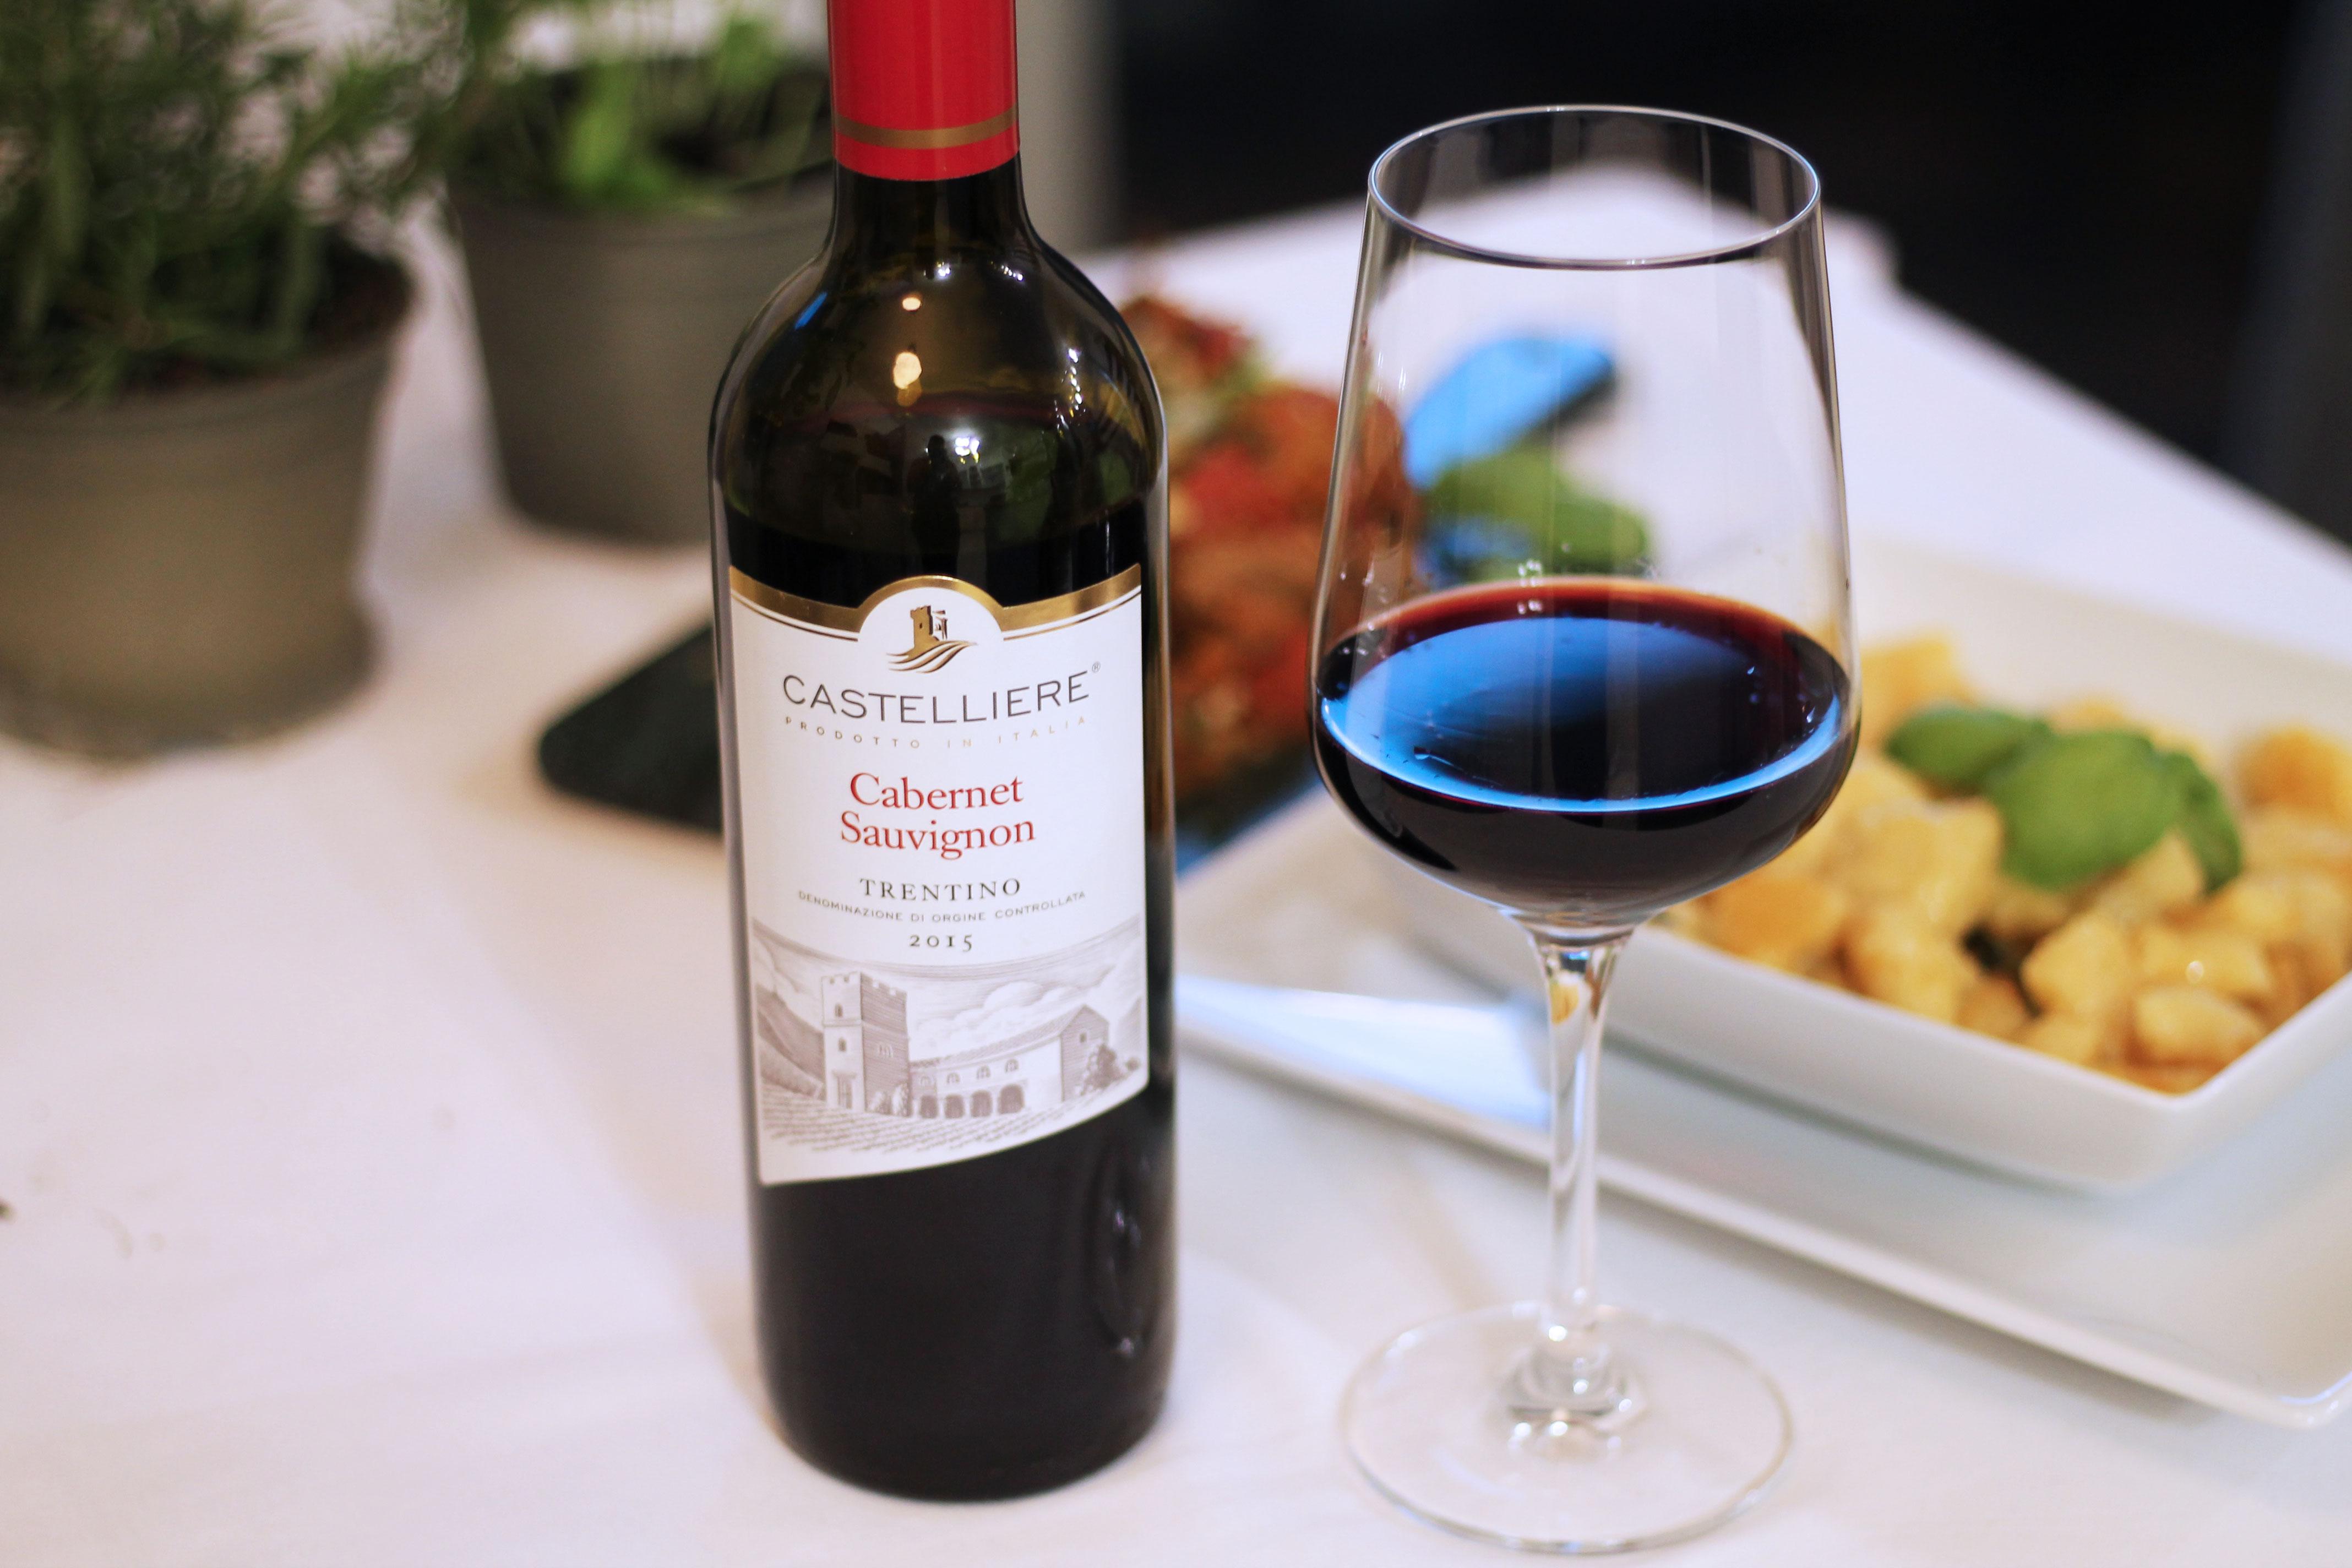 7-geschmackswelten-food-blogparade-italien-kulinarische-momente-italia-italy-rezept-gericht-kardiaserena-rotwein-cabernet-sauvignon-trentino